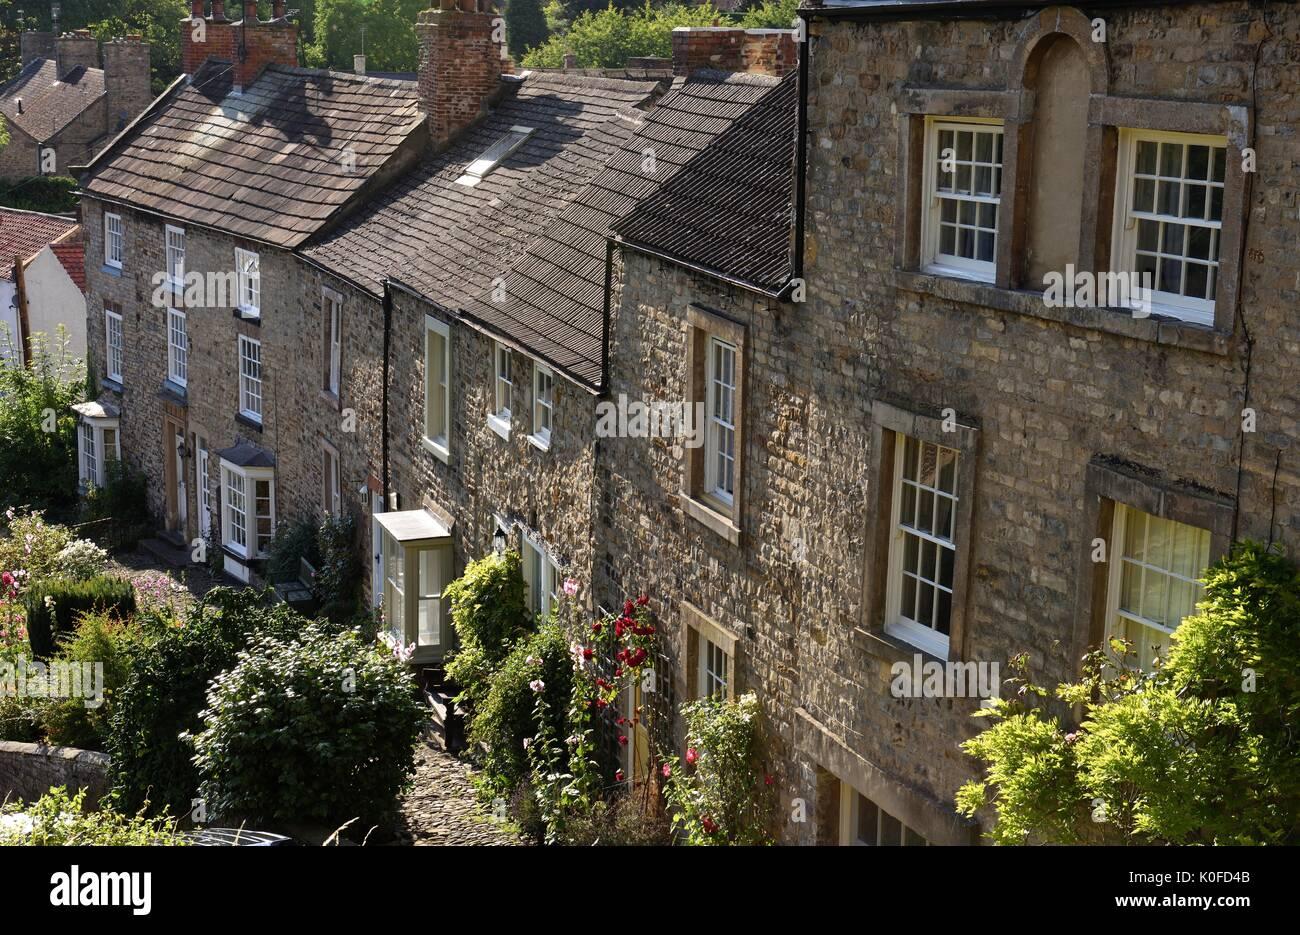 Georgian houses in Richmond Yorkshire - Stock Image